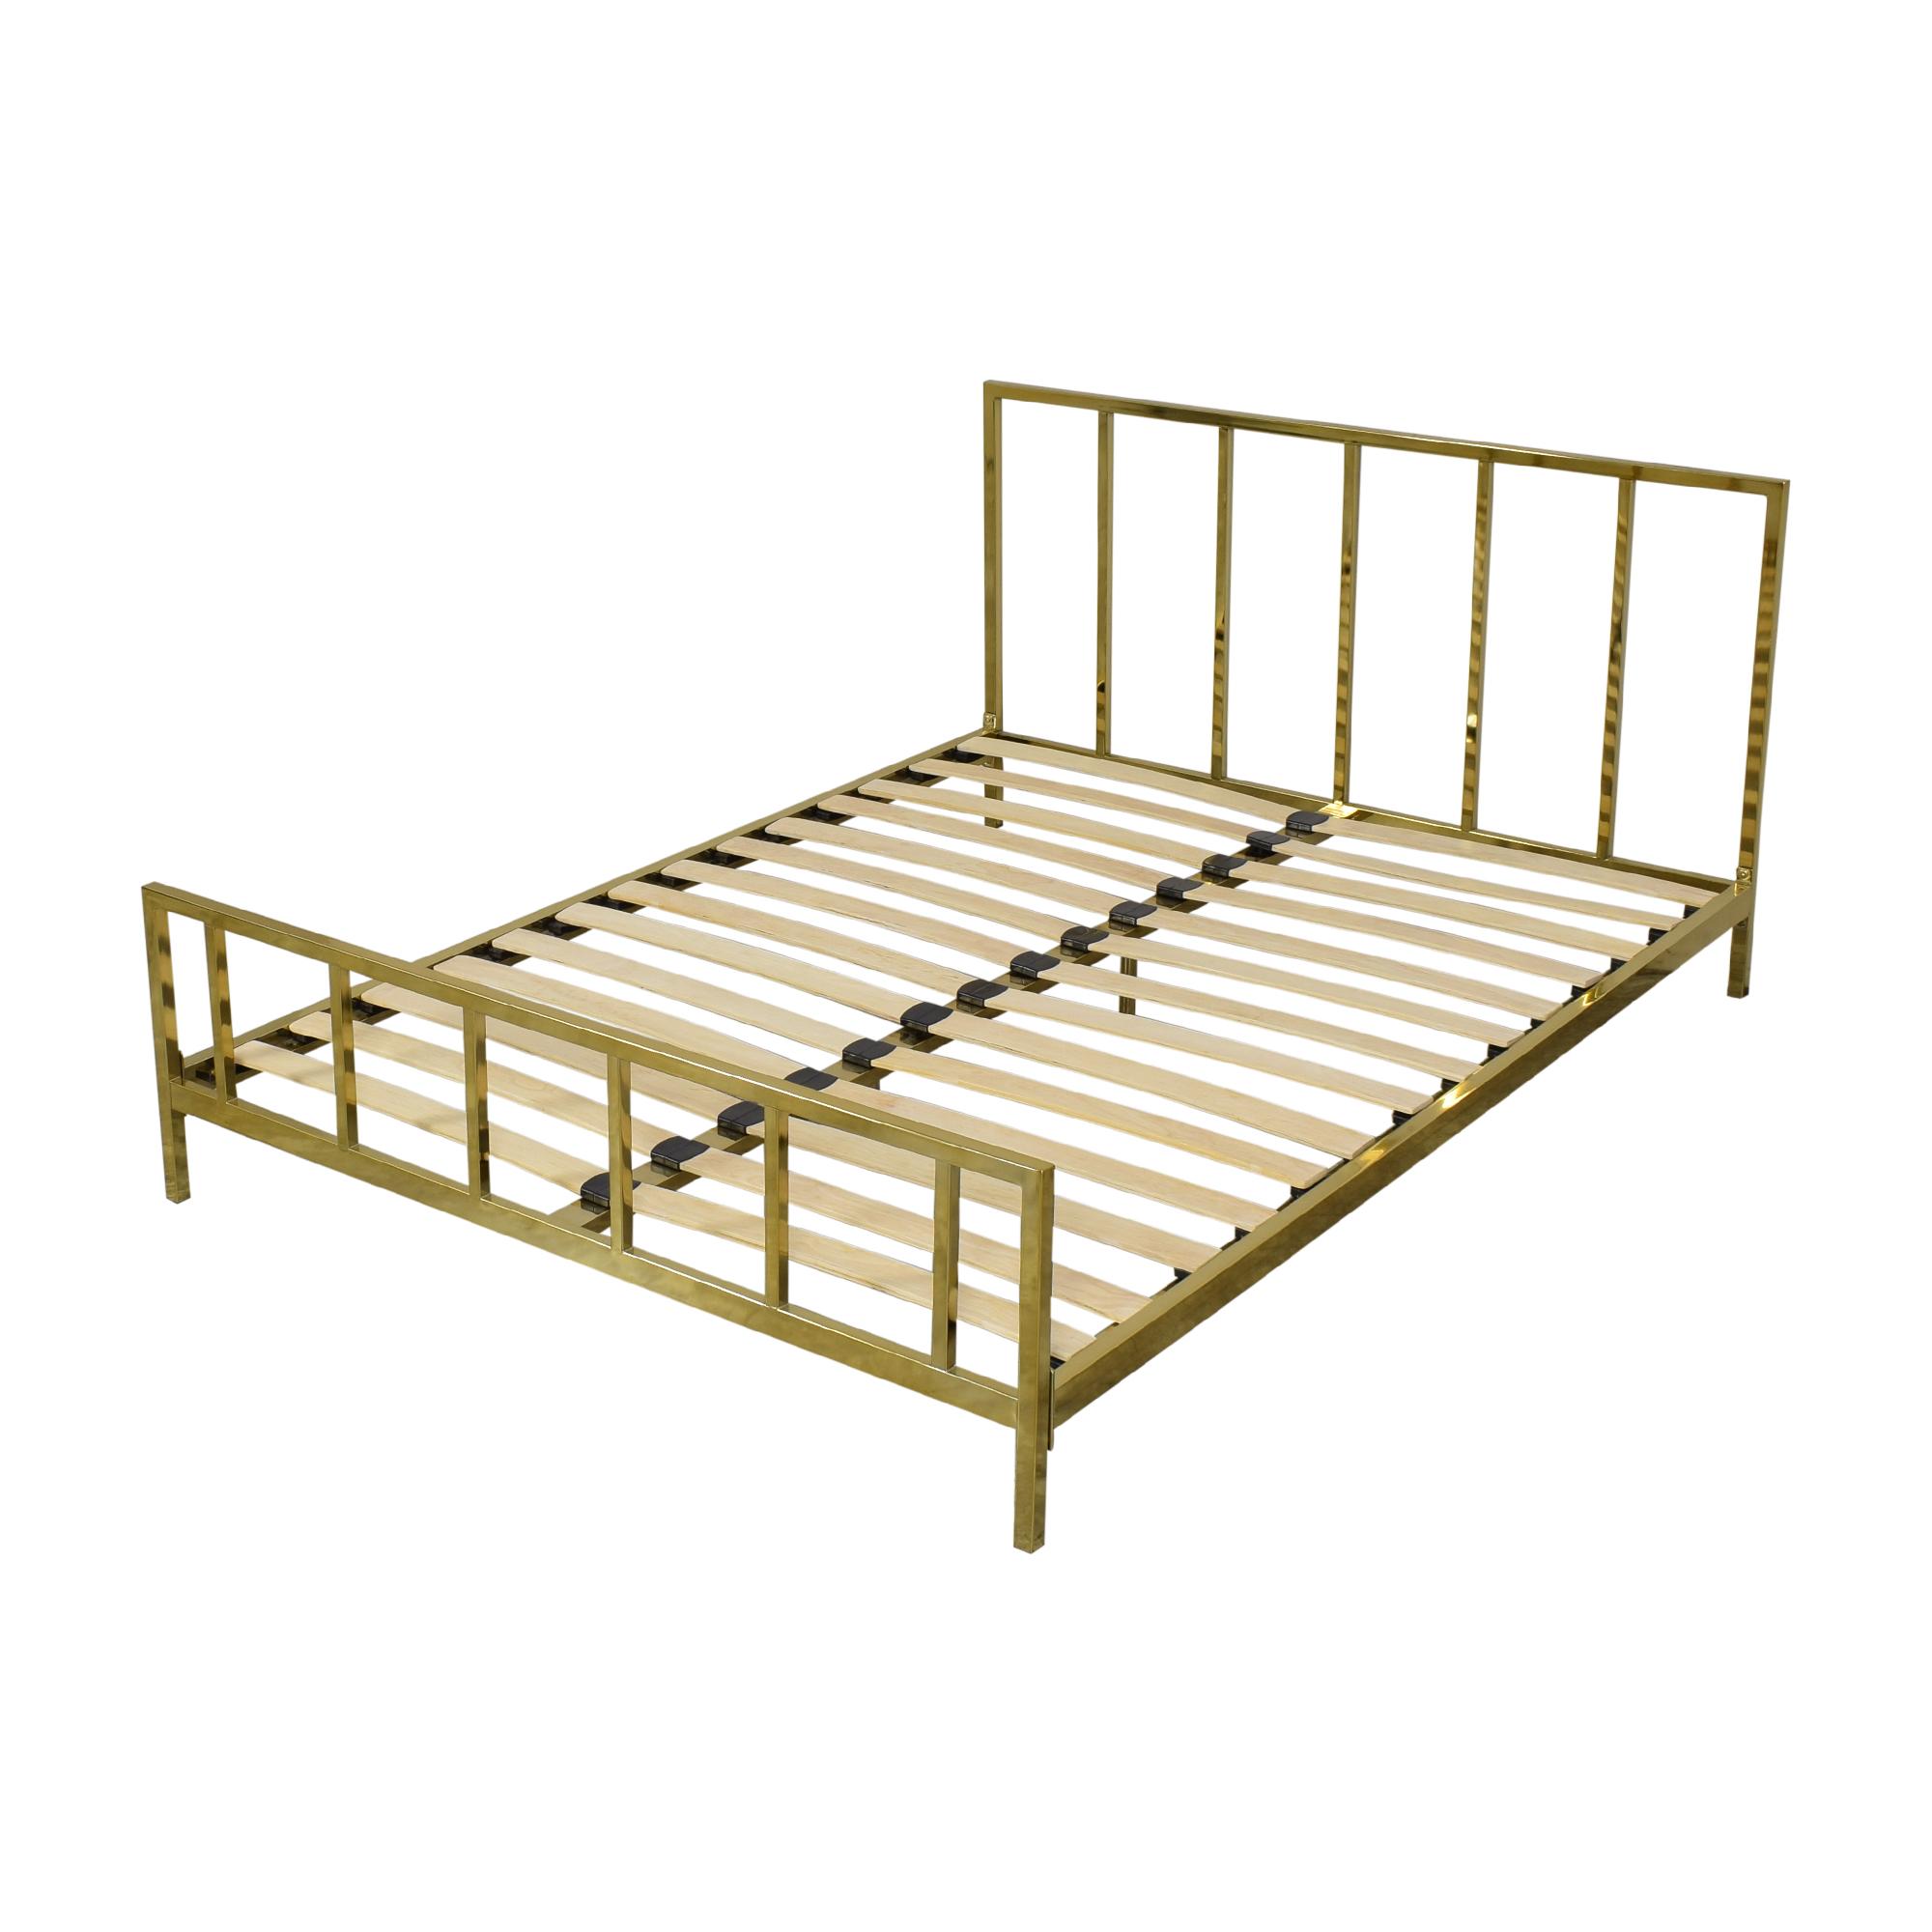 buy CB2 Alchemy Full Bronze Bed CB2 Bed Frames